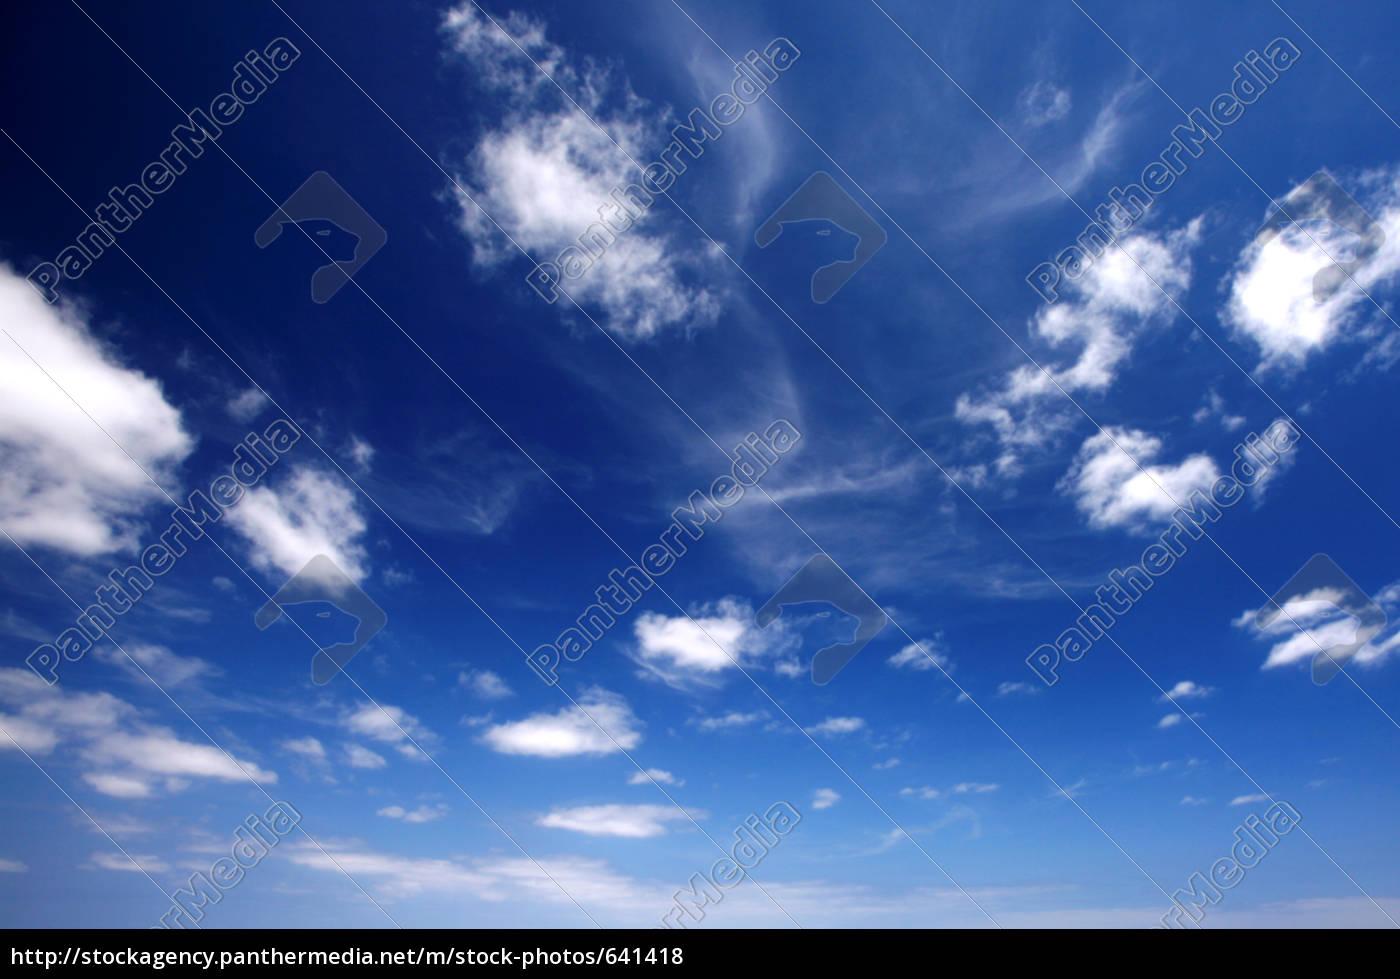 heavenly - 641418